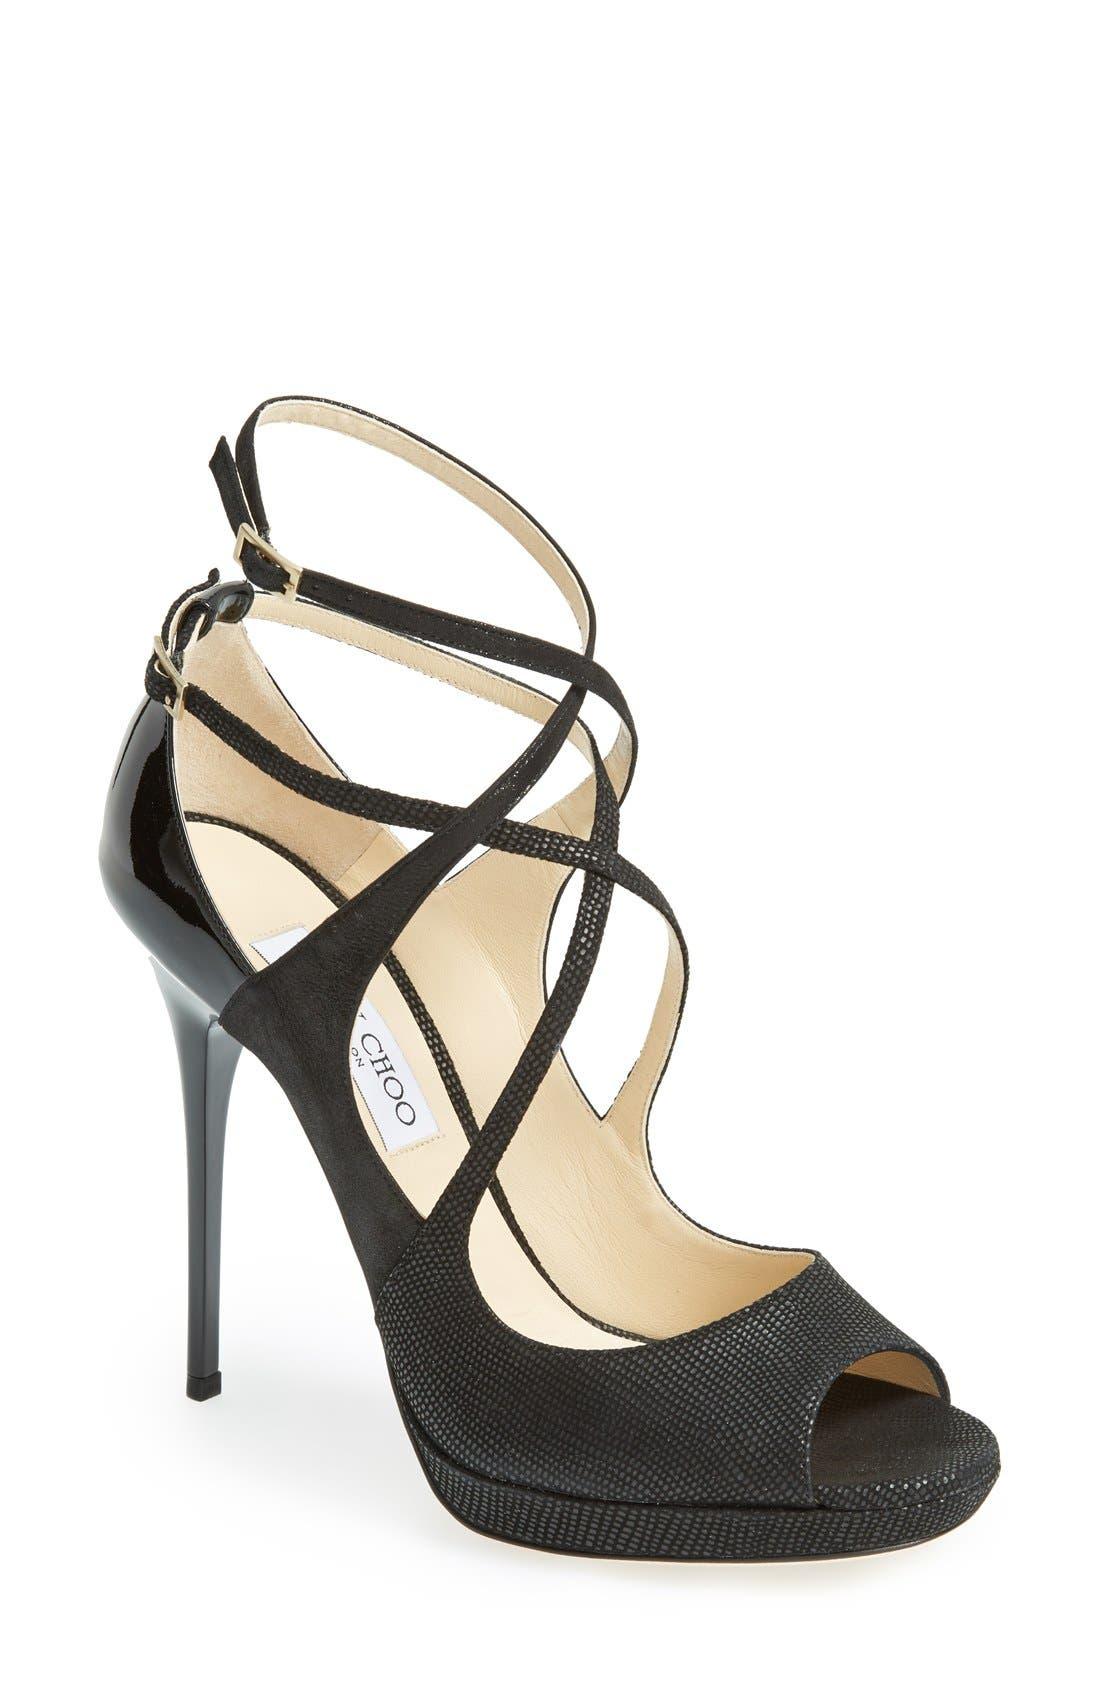 Main Image - Jimmy Choo 'Atlas' Platform Sandal (Women)